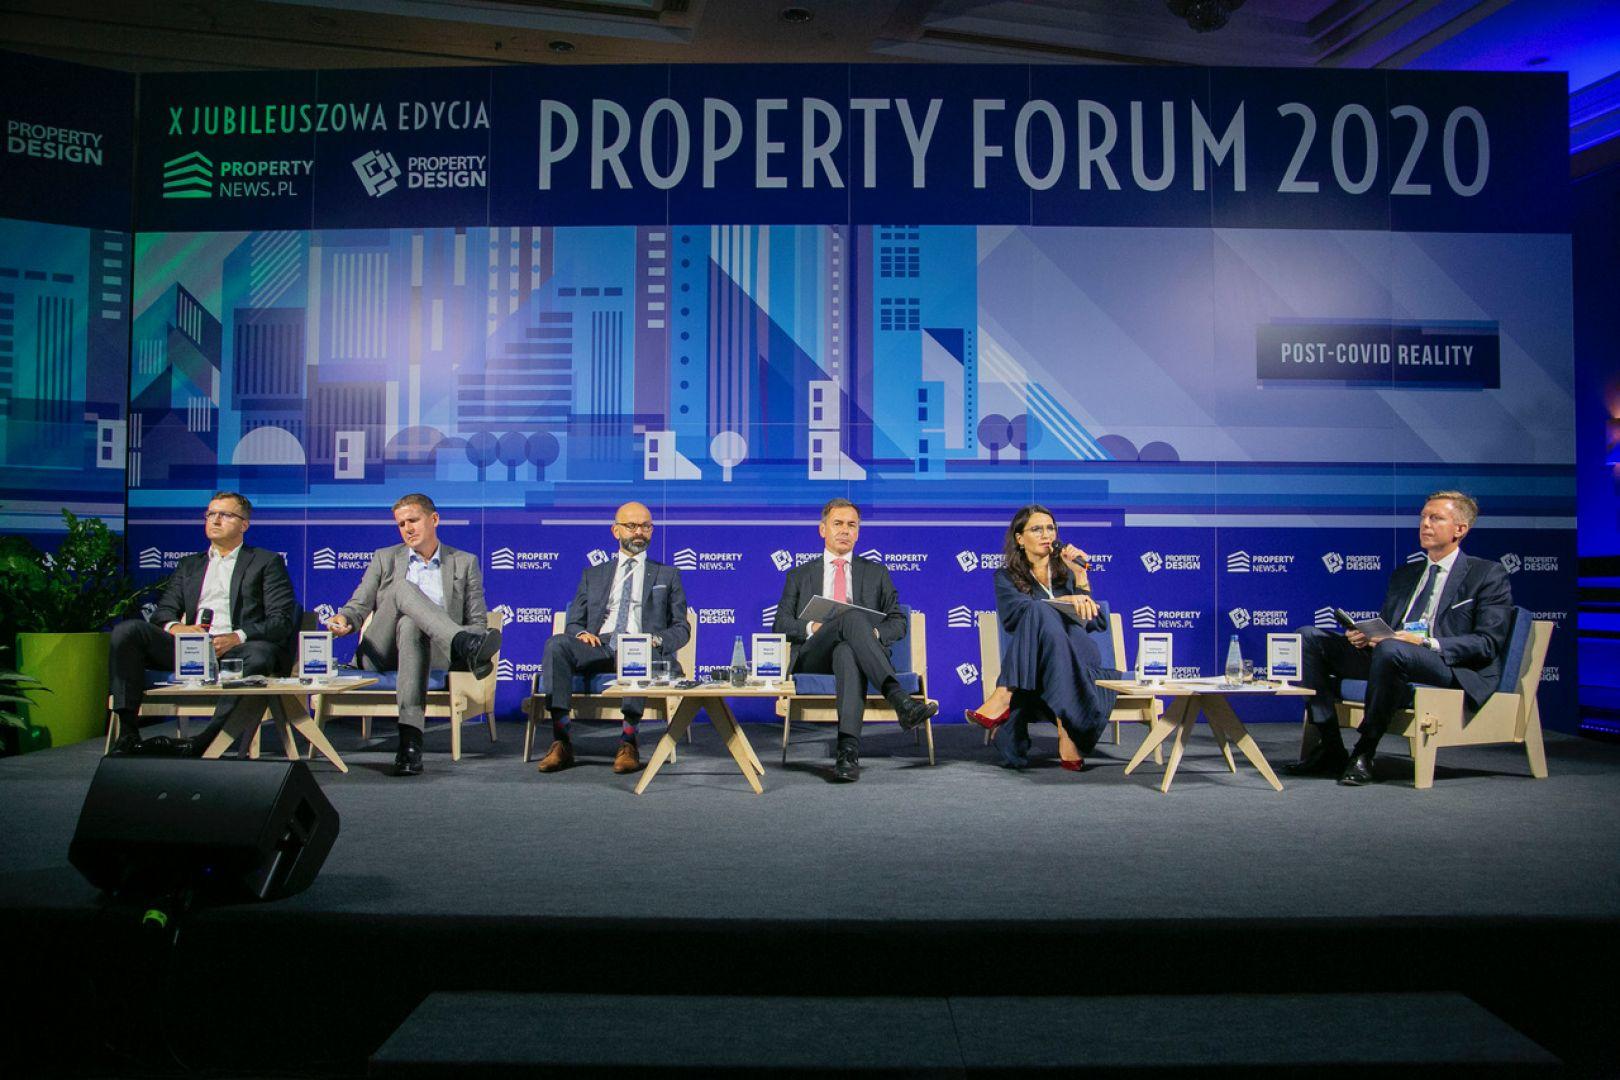 Property Forum 2020